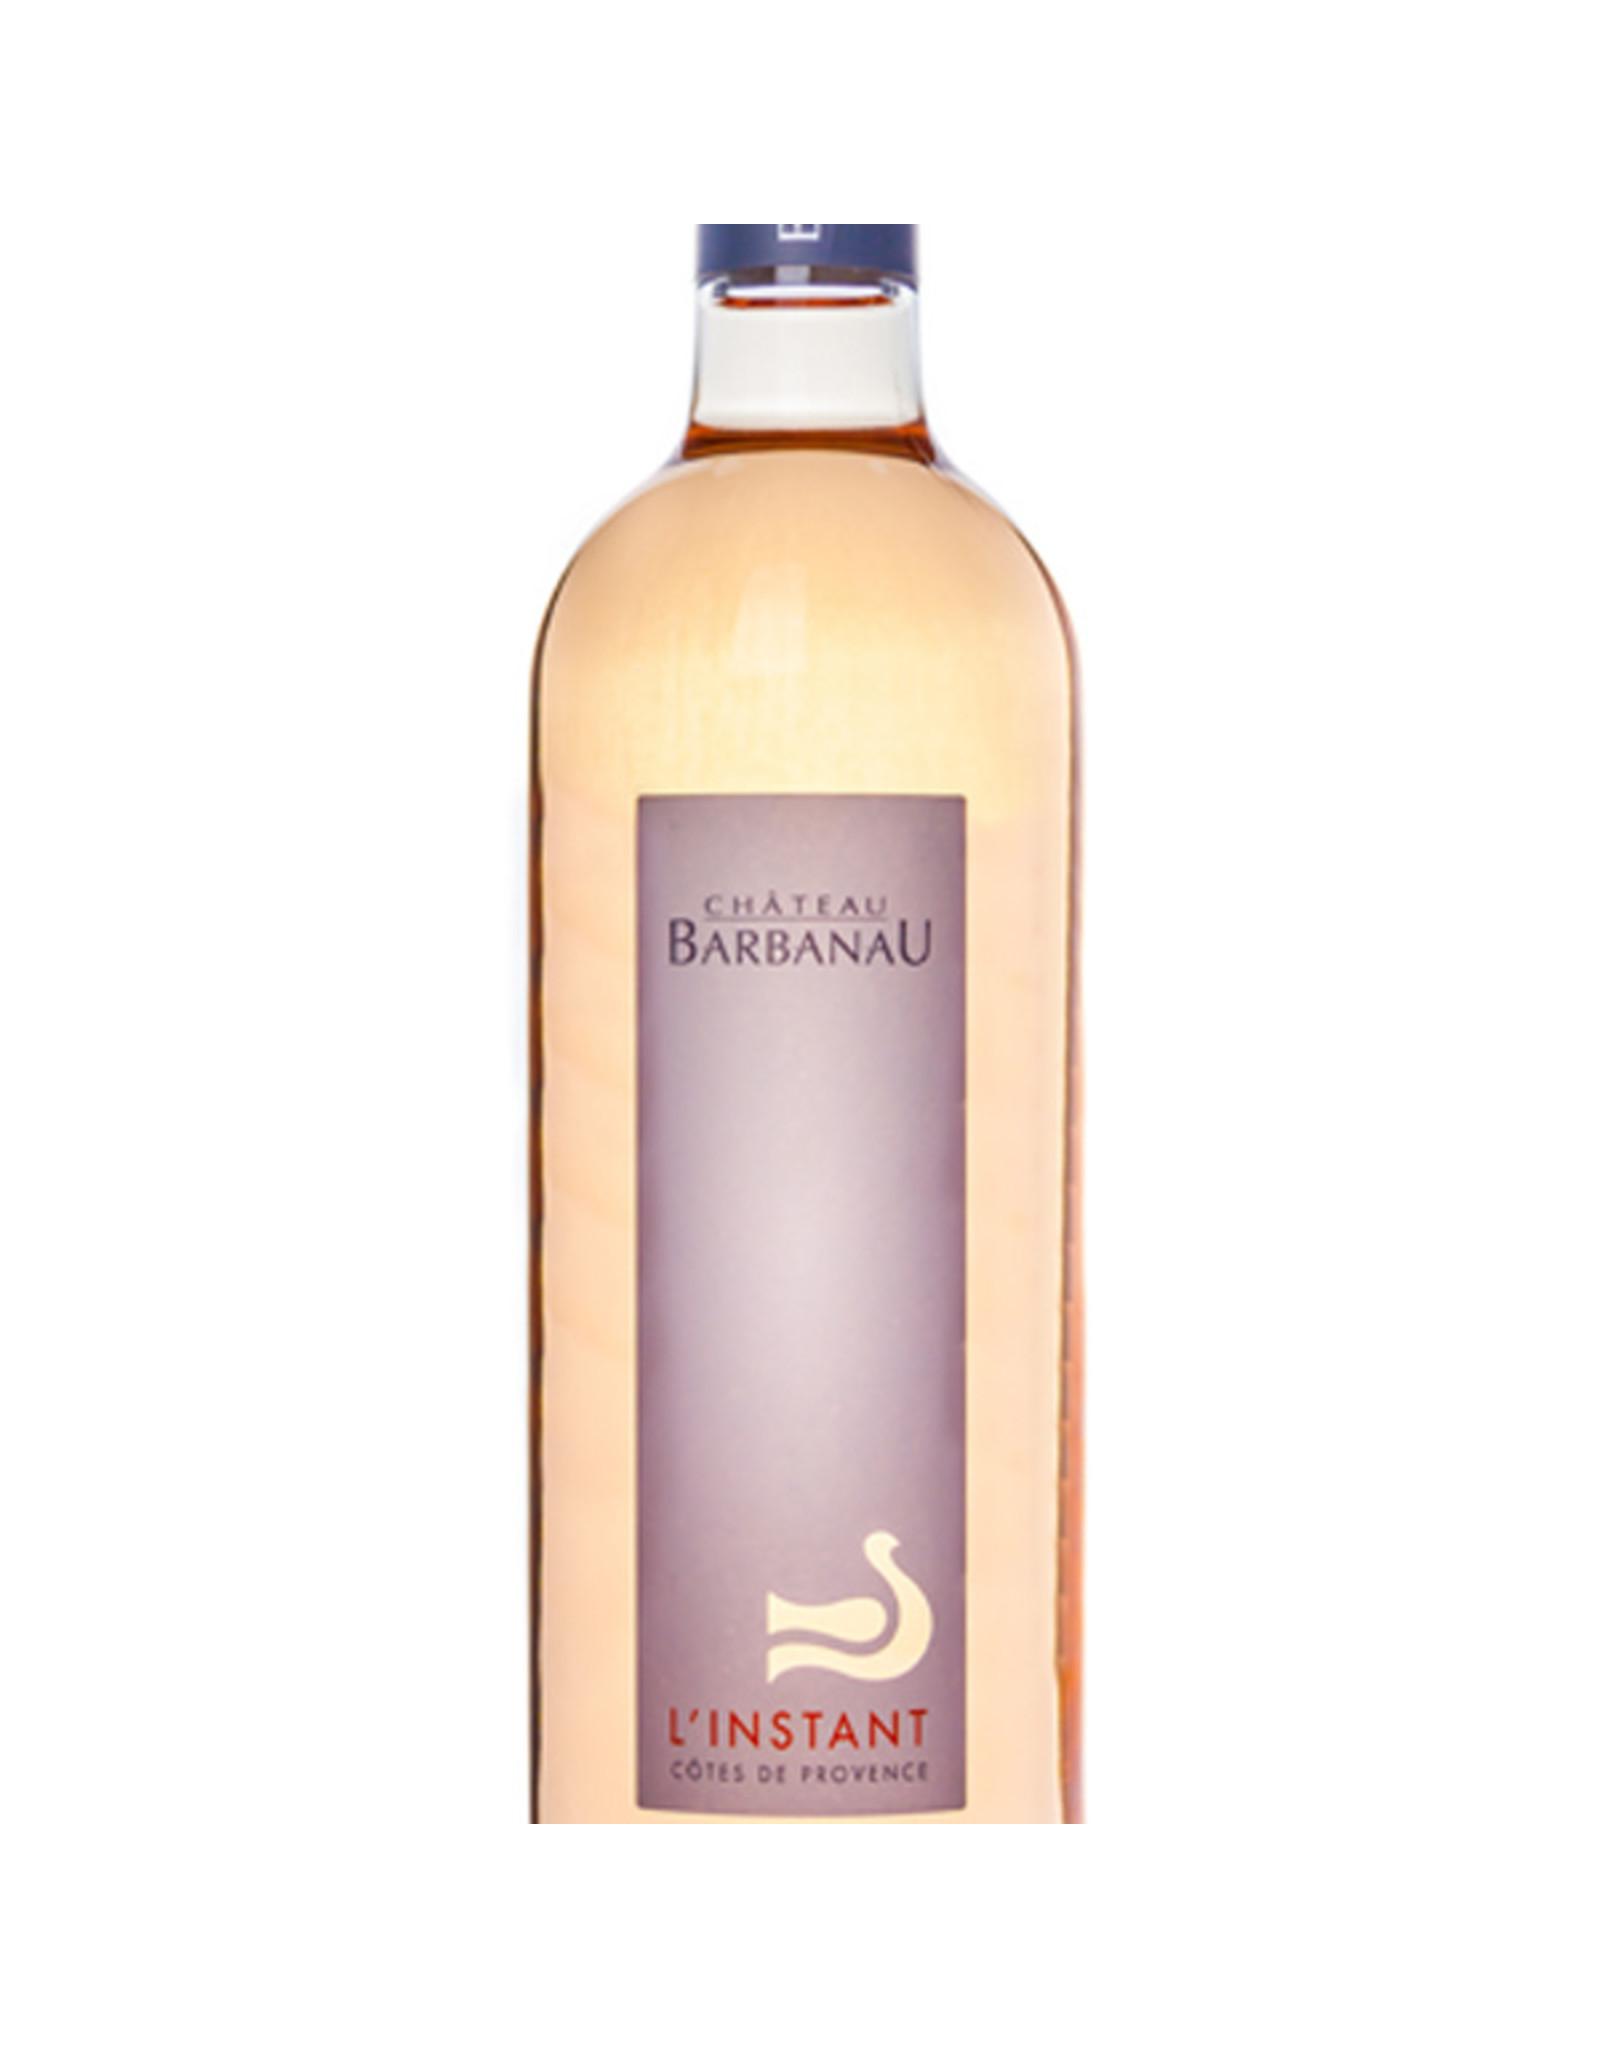 Château Barbanau, Roquefort Barbanau Provence Rosé L'Instant 2019 magnum